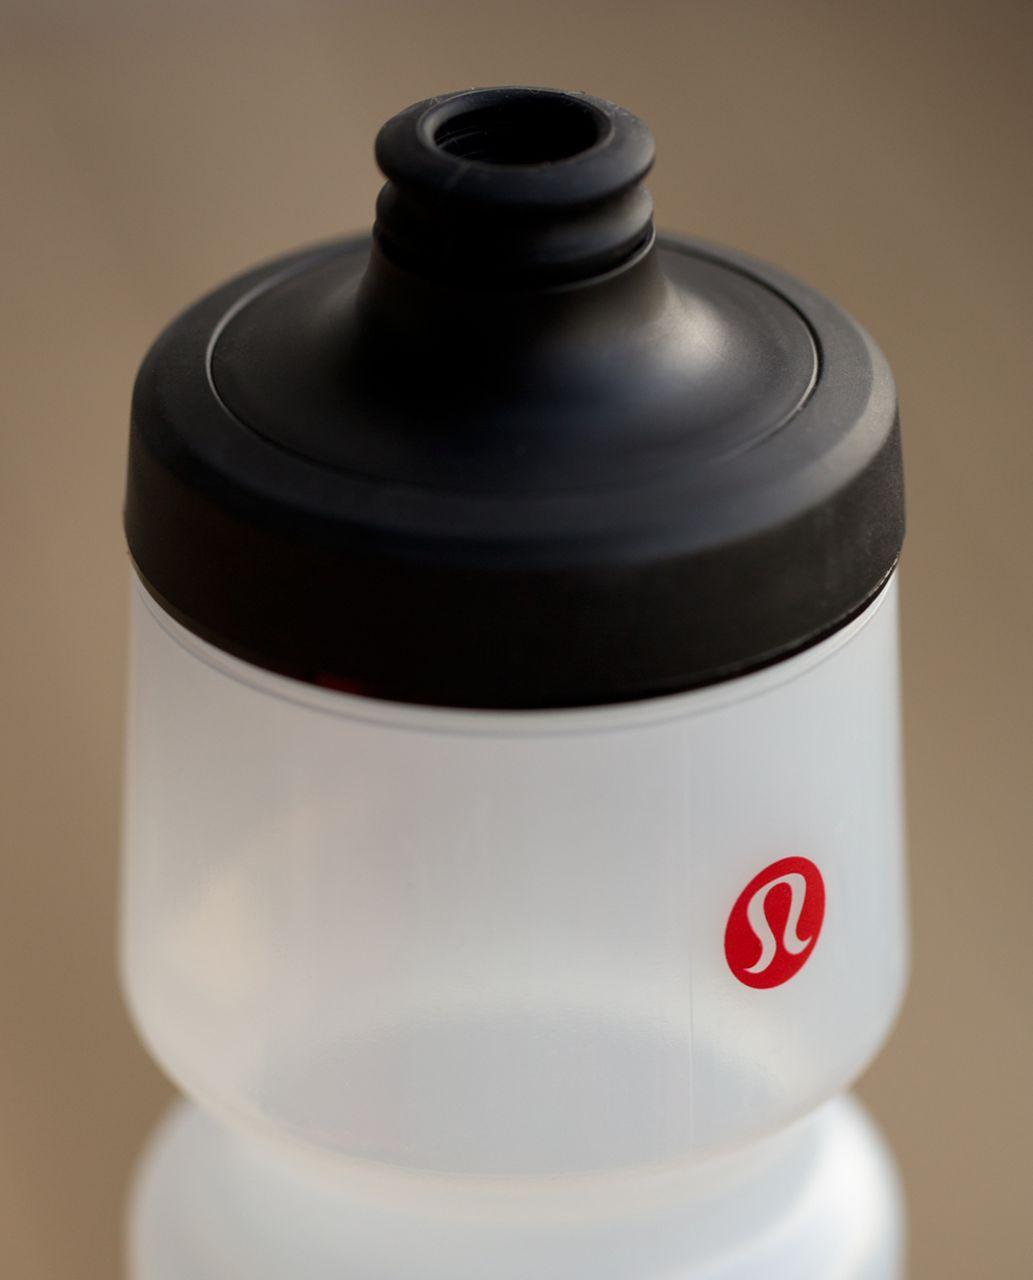 Lululemon Purist Cycling Water Bottle - Game Set Match Black Lulu Red